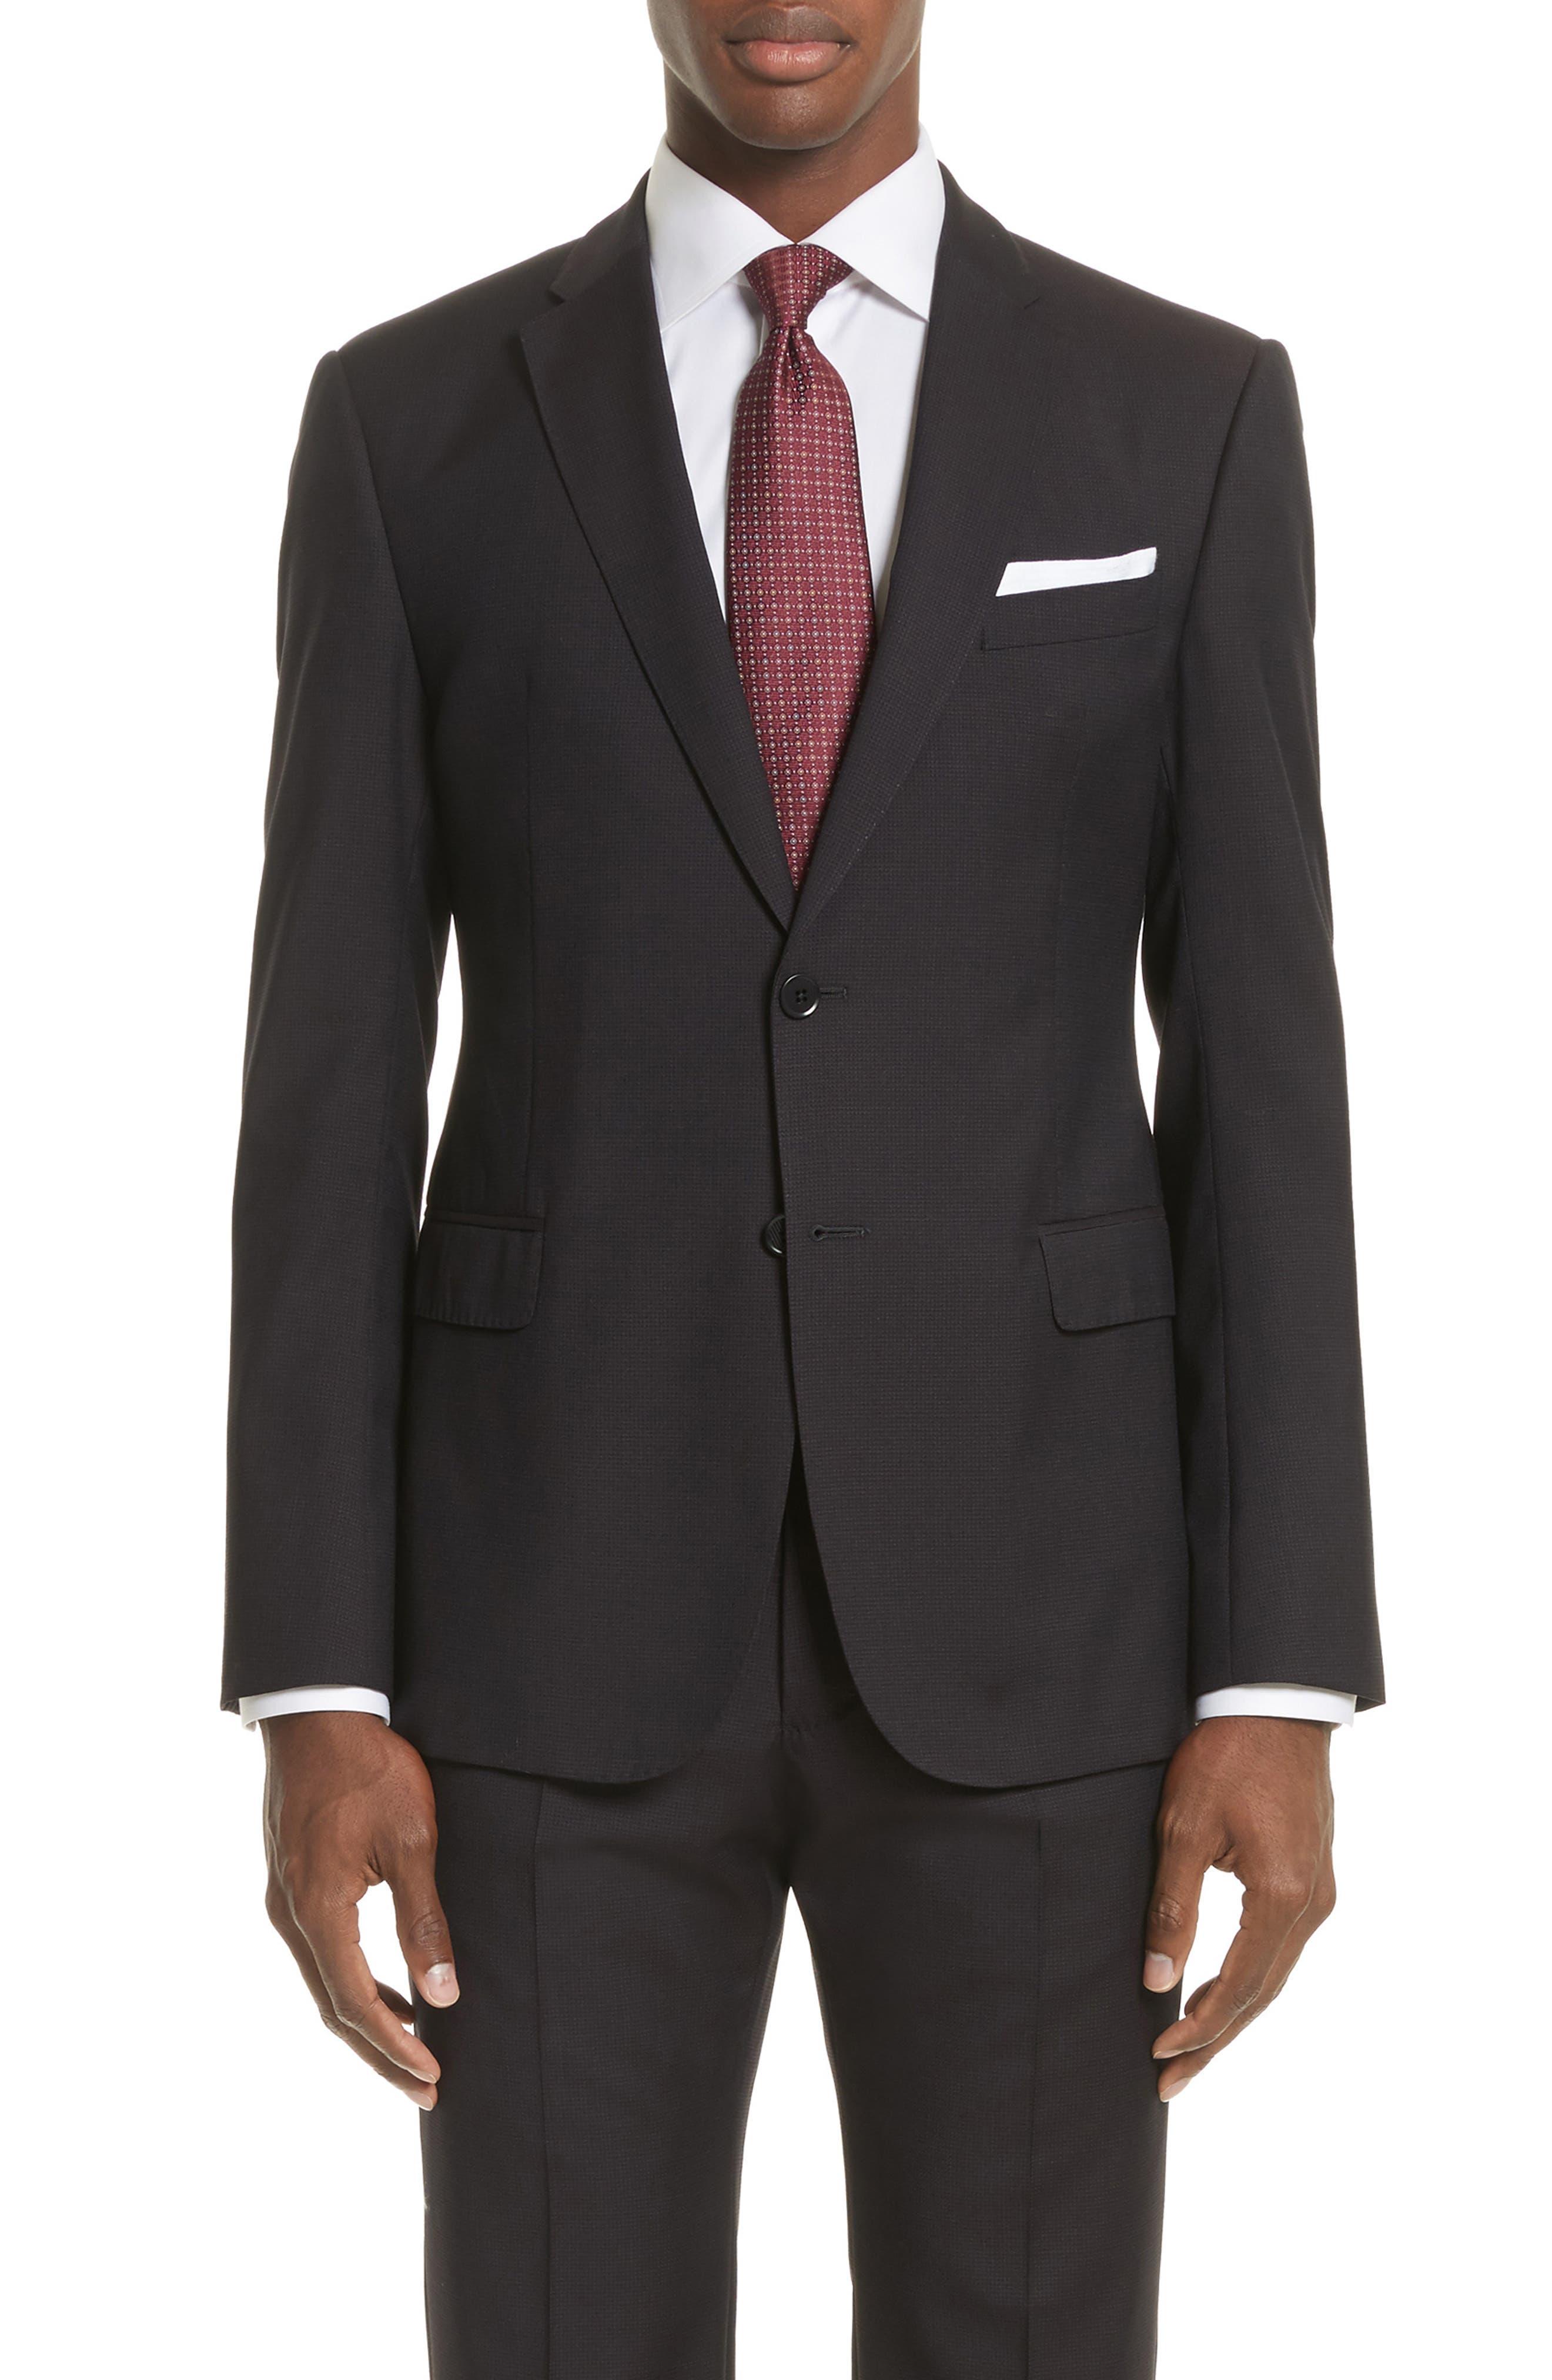 Emporio Armani M-Line Trim Fit Solid Wool Suit